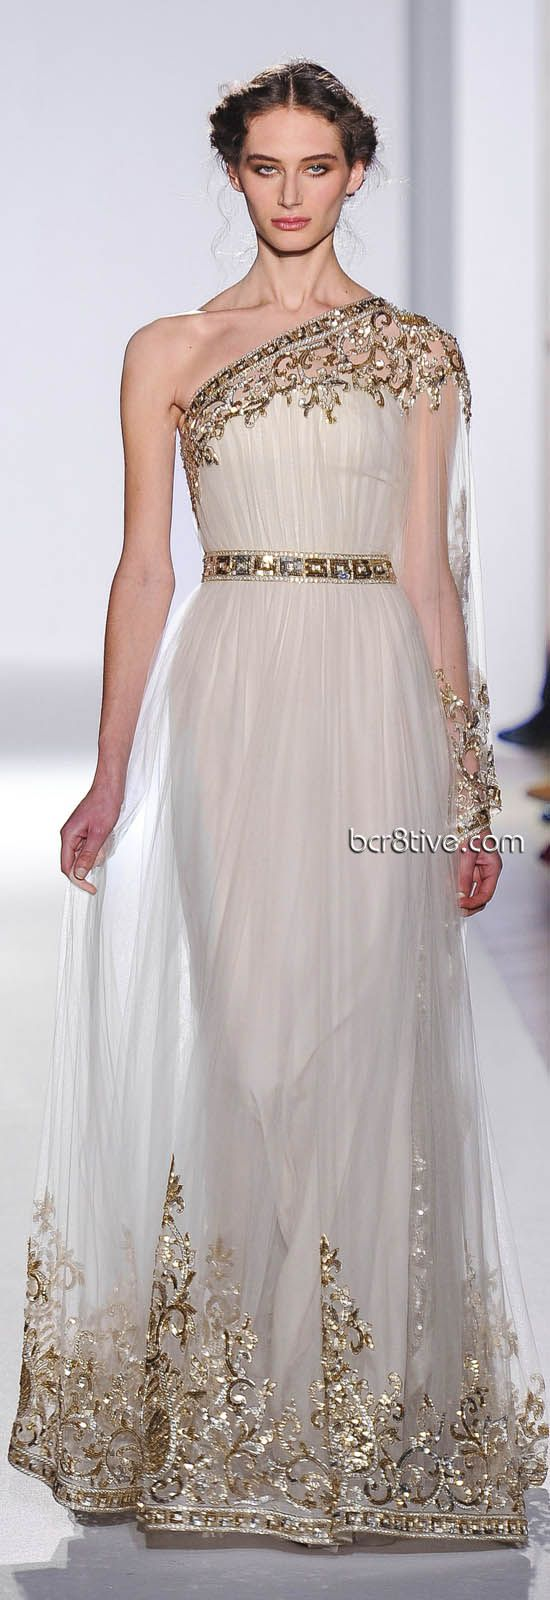 Zuhair murad spring summer haute couture collection haute